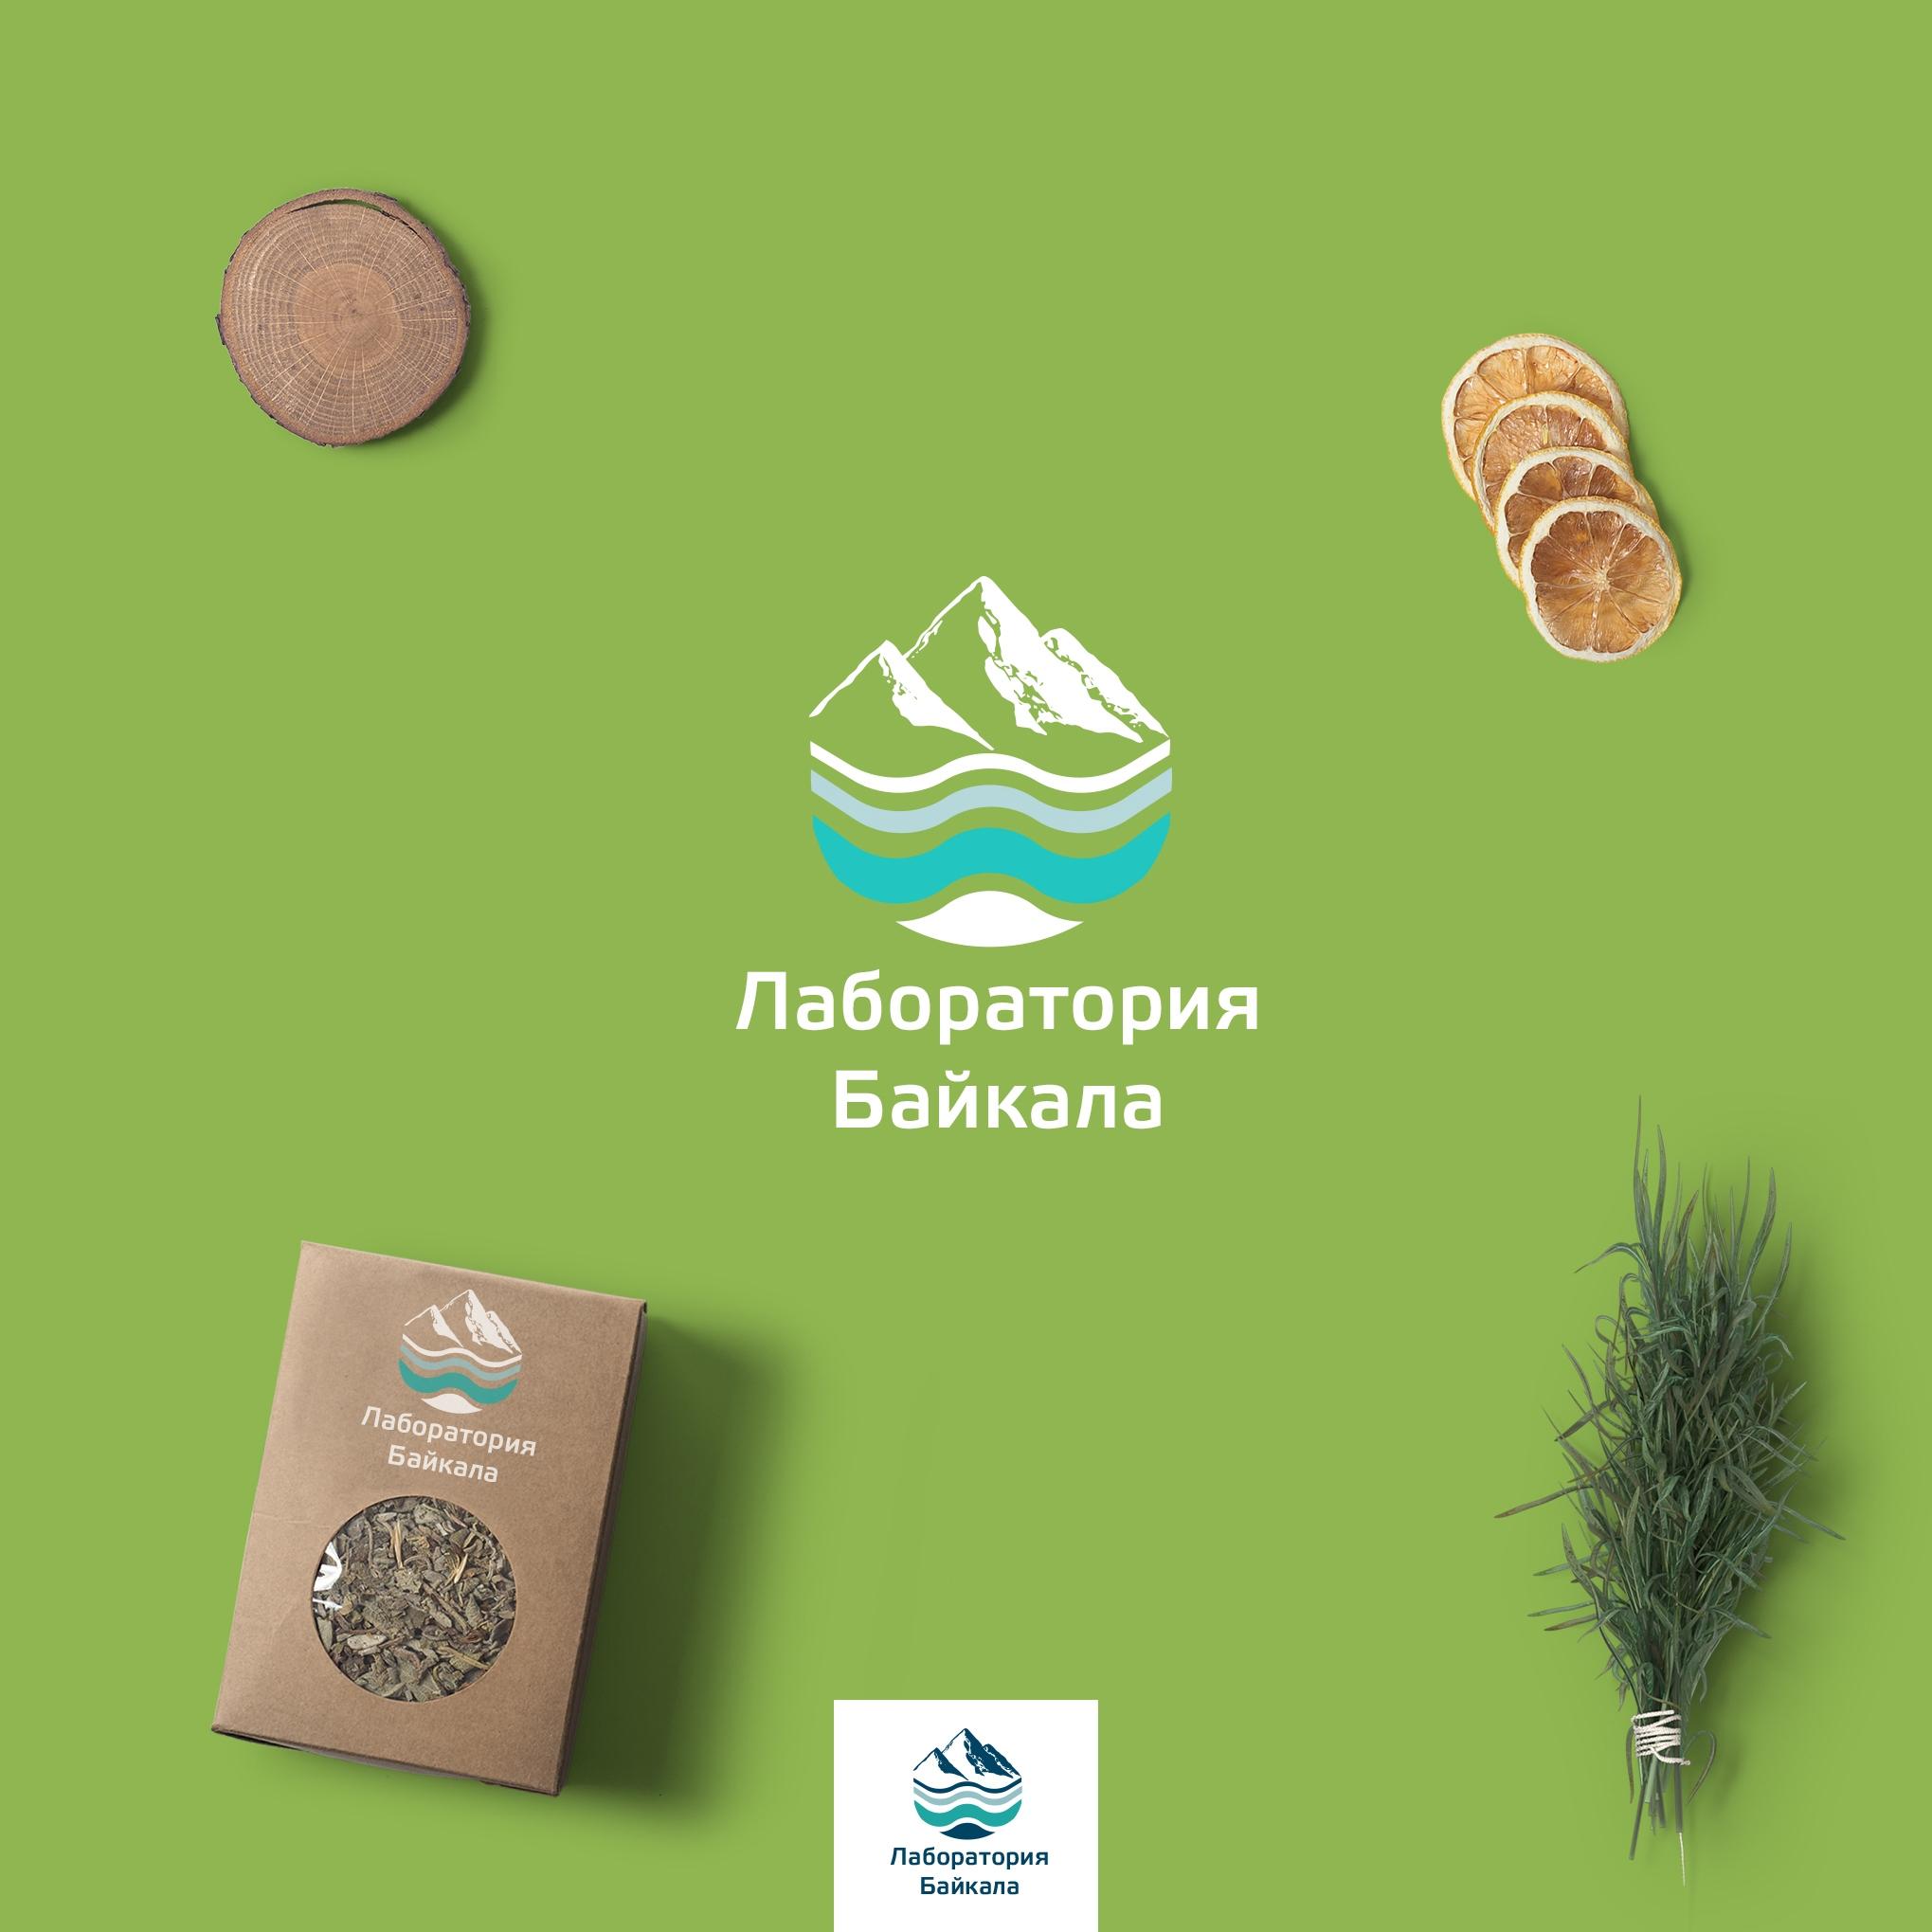 Разработка логотипа торговой марки фото f_1545971b8022afc6.jpg